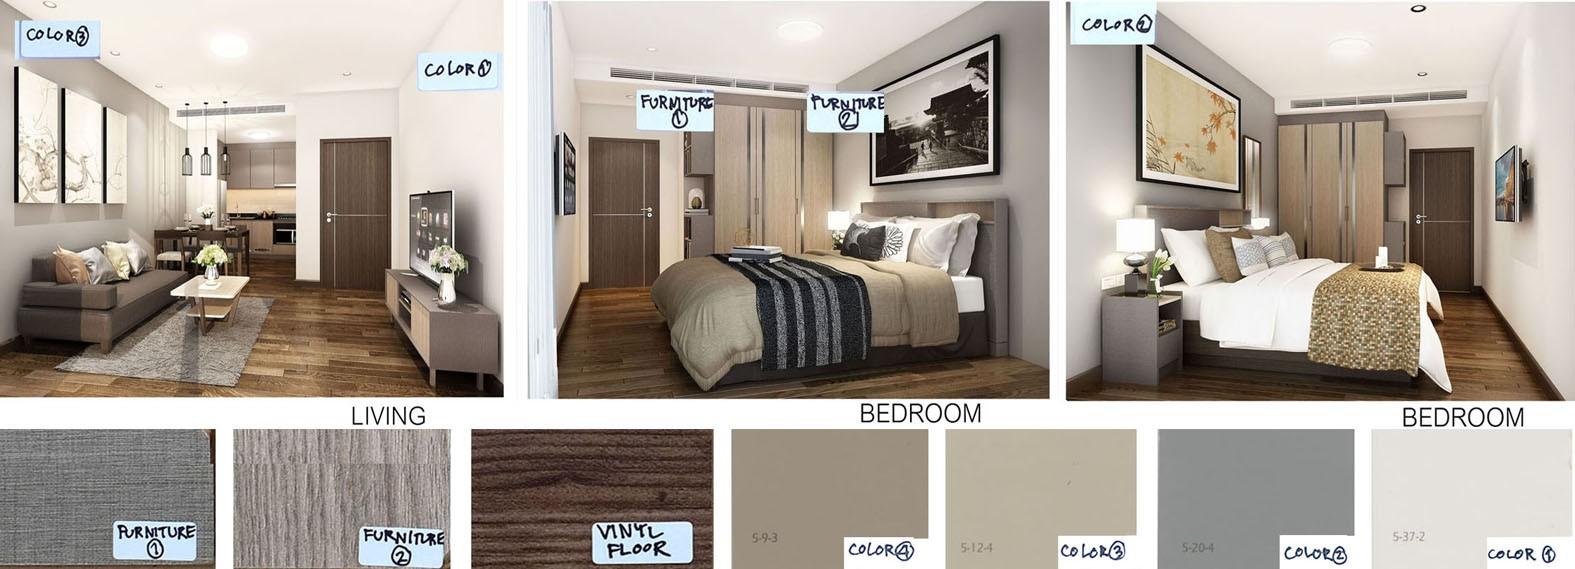 New Hotel U0026 Apartment RESIDENCE | ISpace